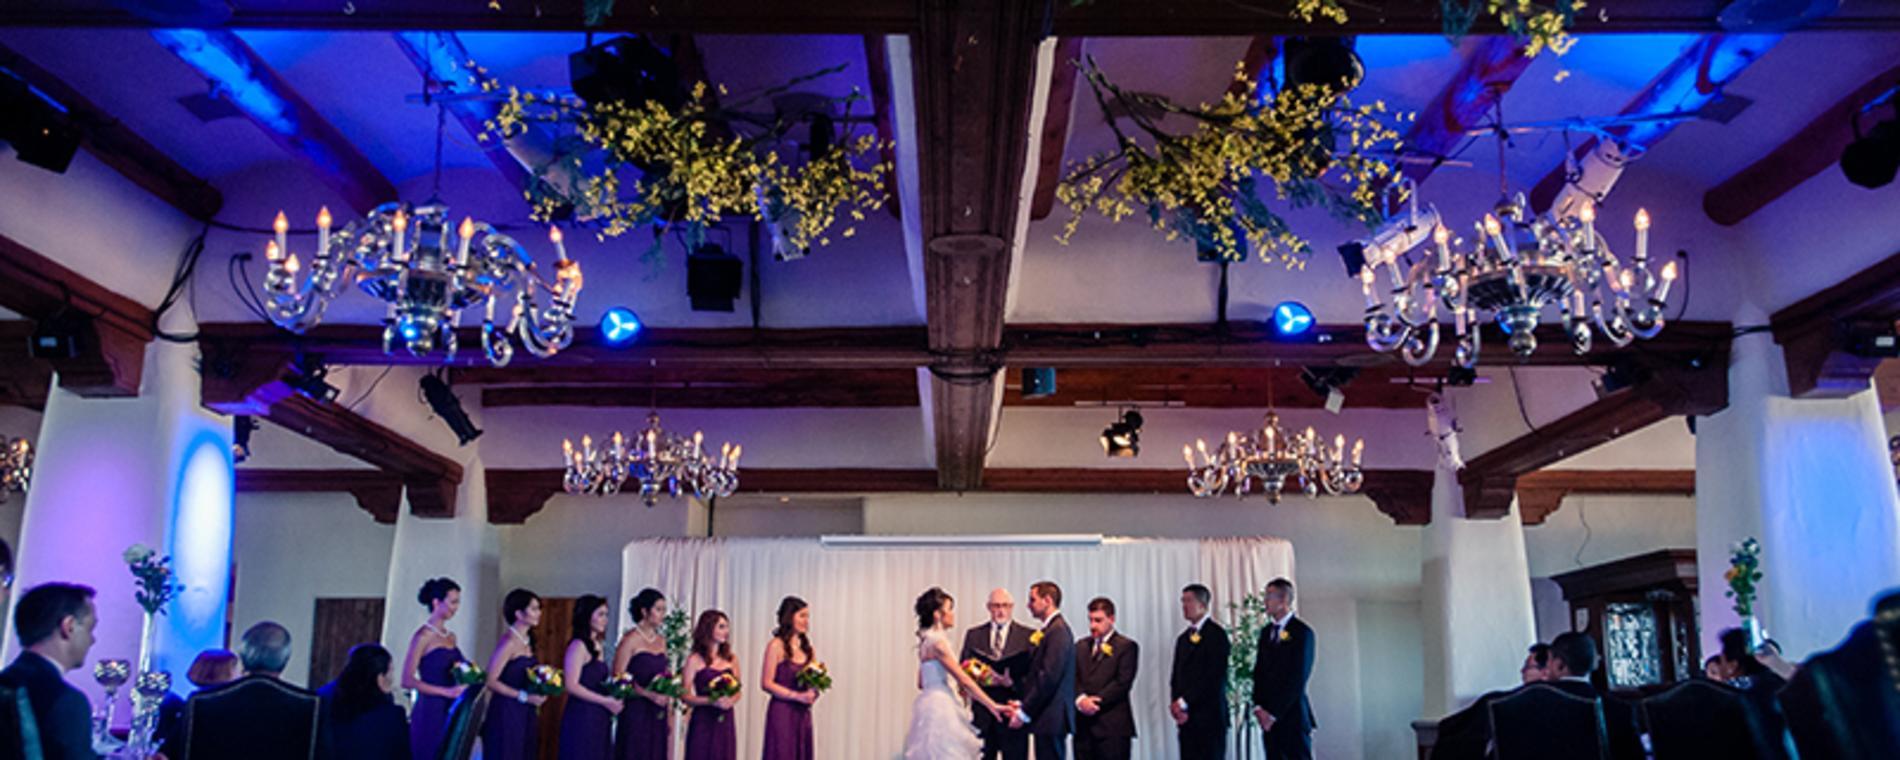 Petroleum Club Wedding Venue